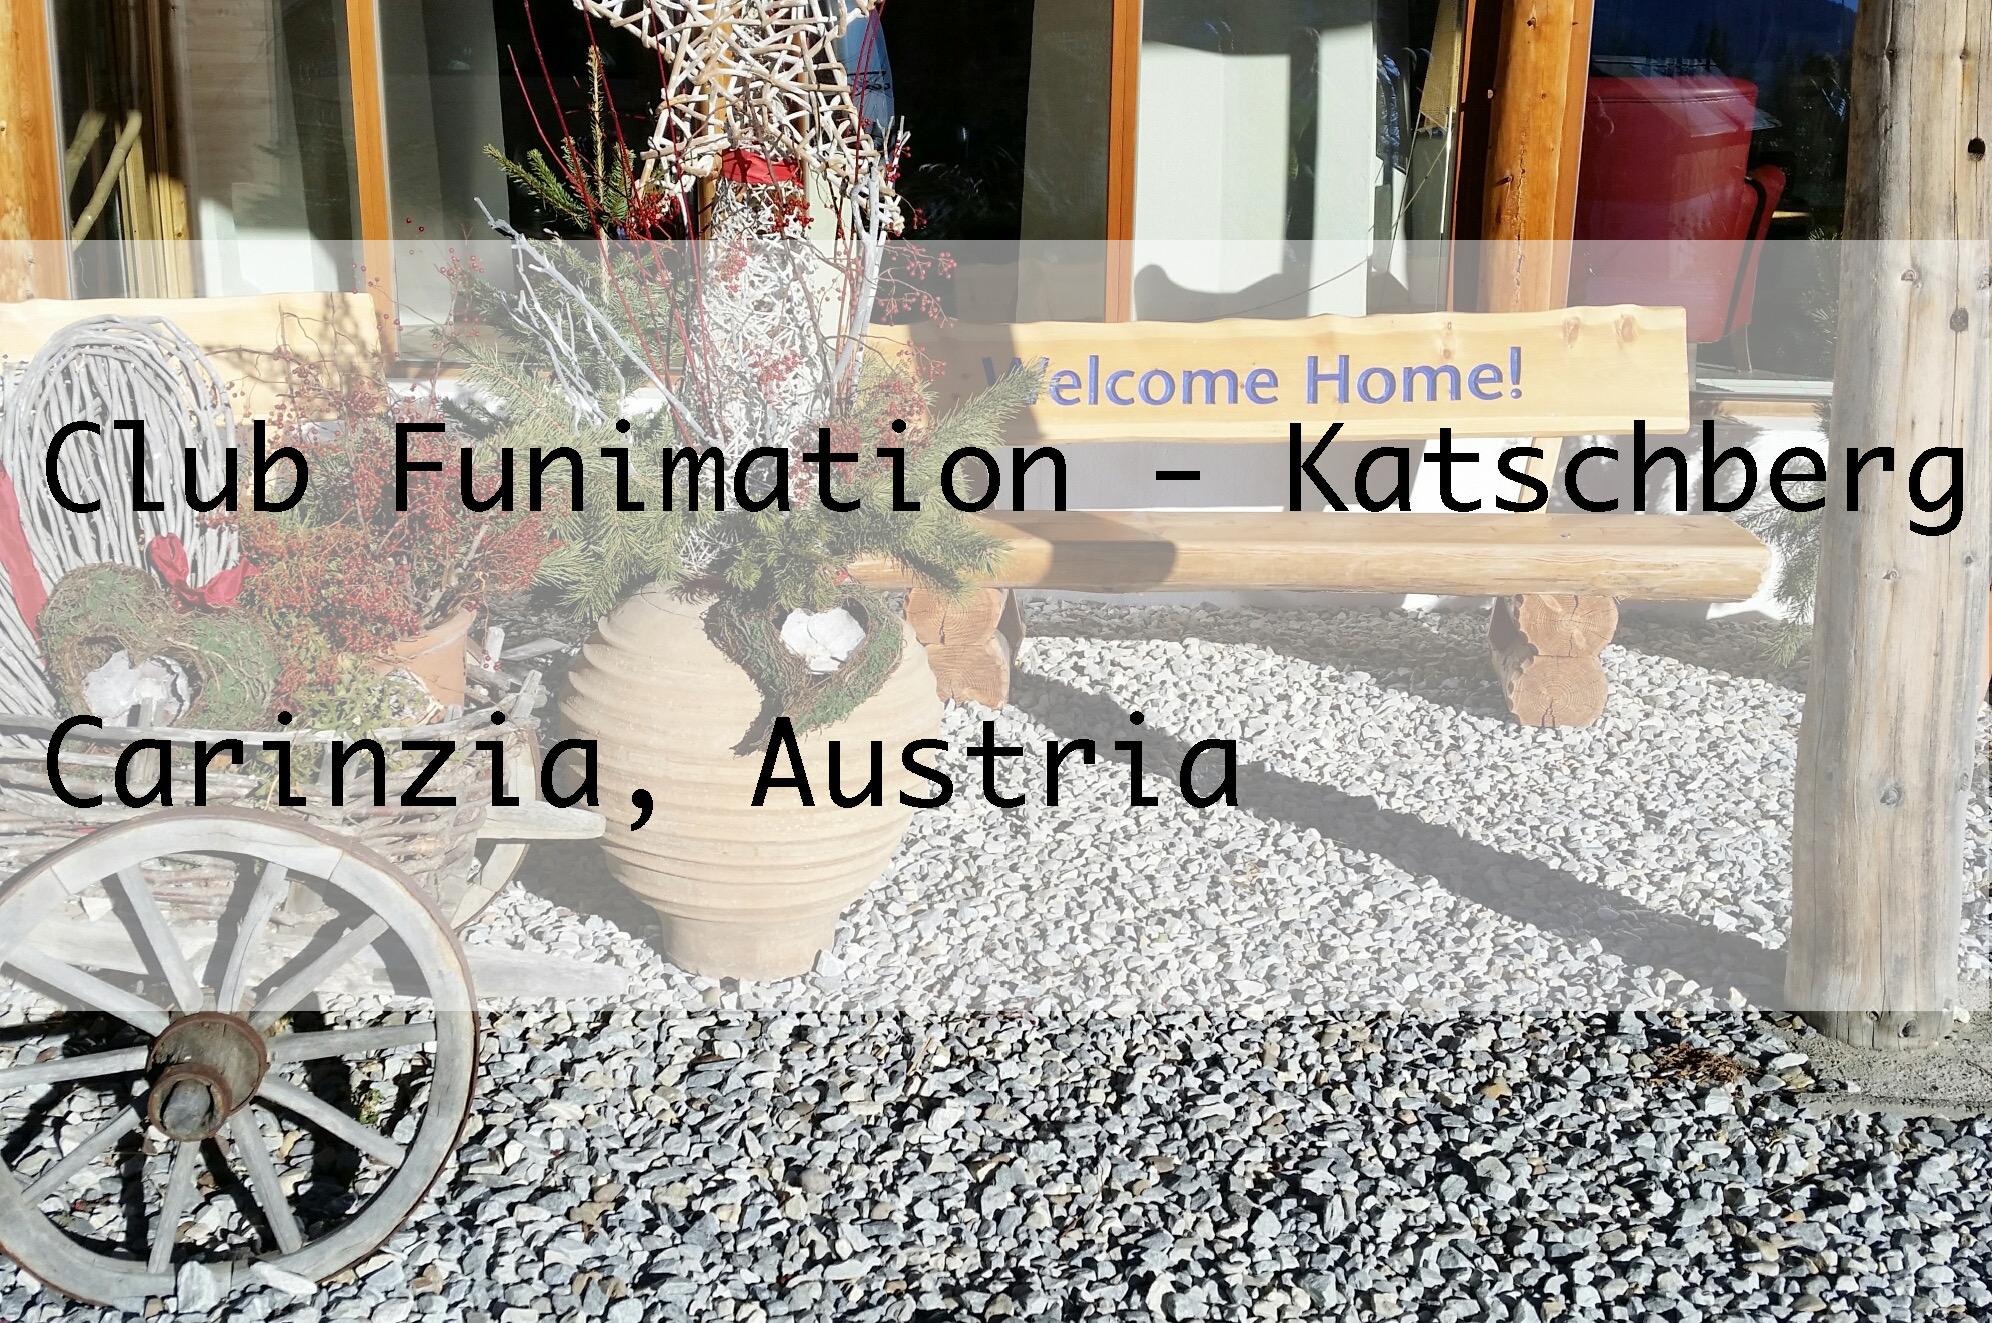 Club Funimation Katschberg